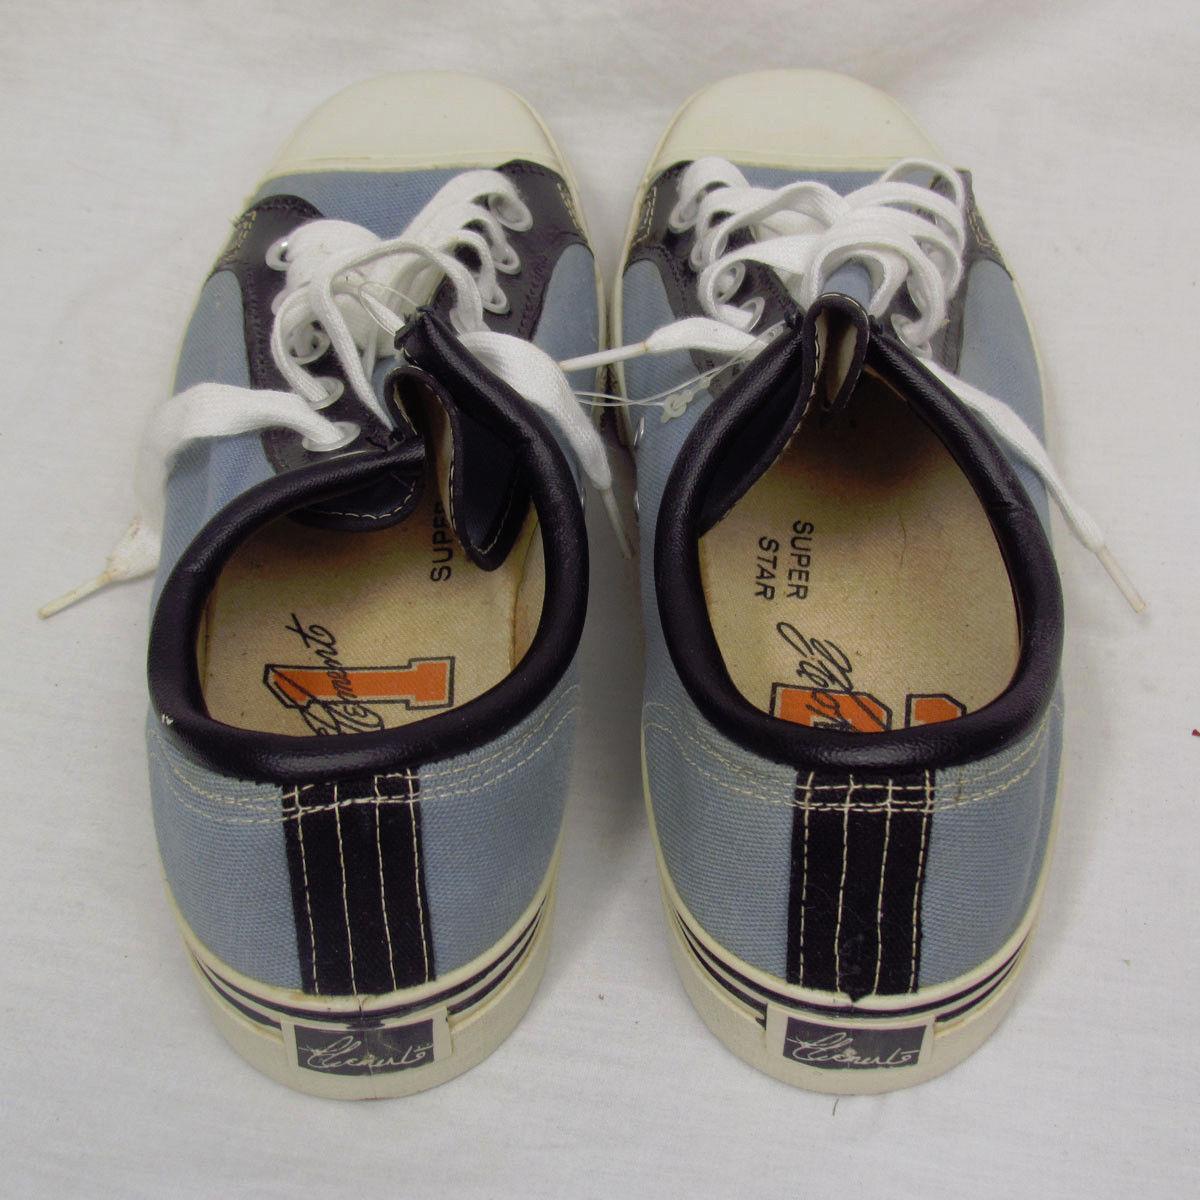 7fb87d18d485e ... roberto clemento 1972 puerto rico exclusive sneakers